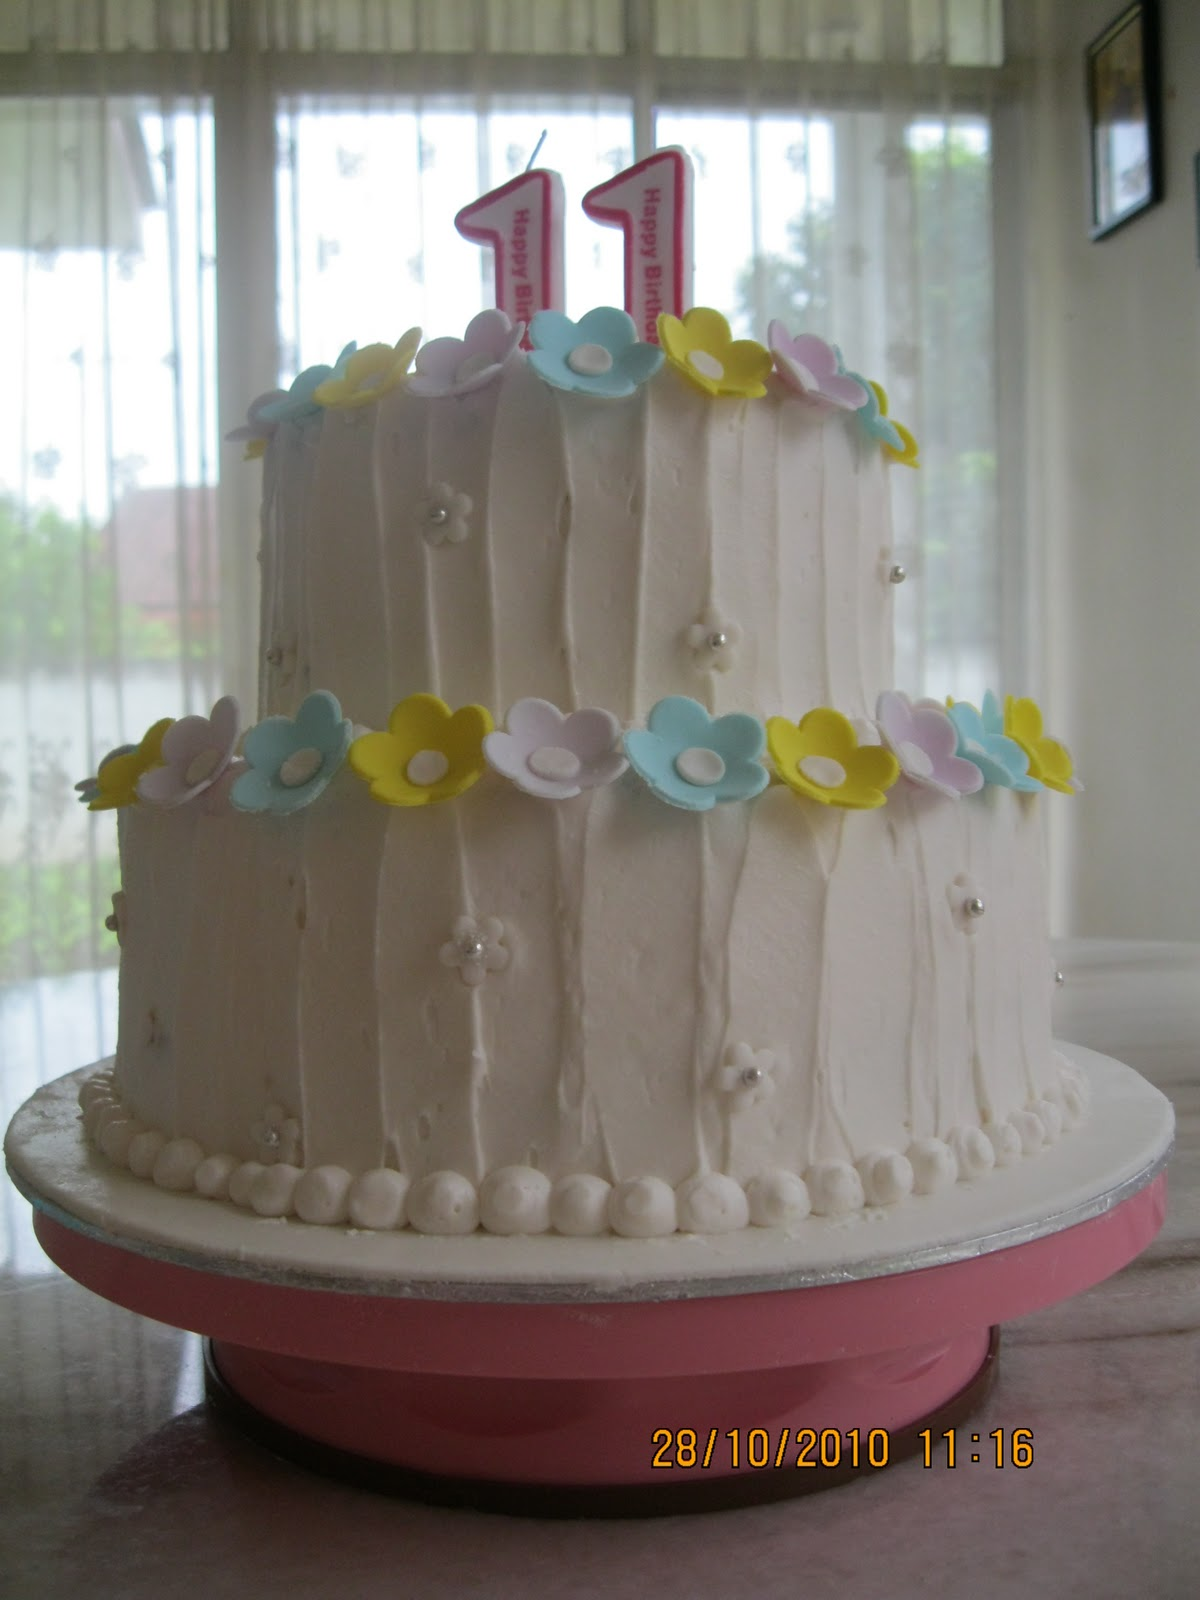 Fun Cakez Princezz 11th Birthday Cake 2 Tier Carrot Cake Covered